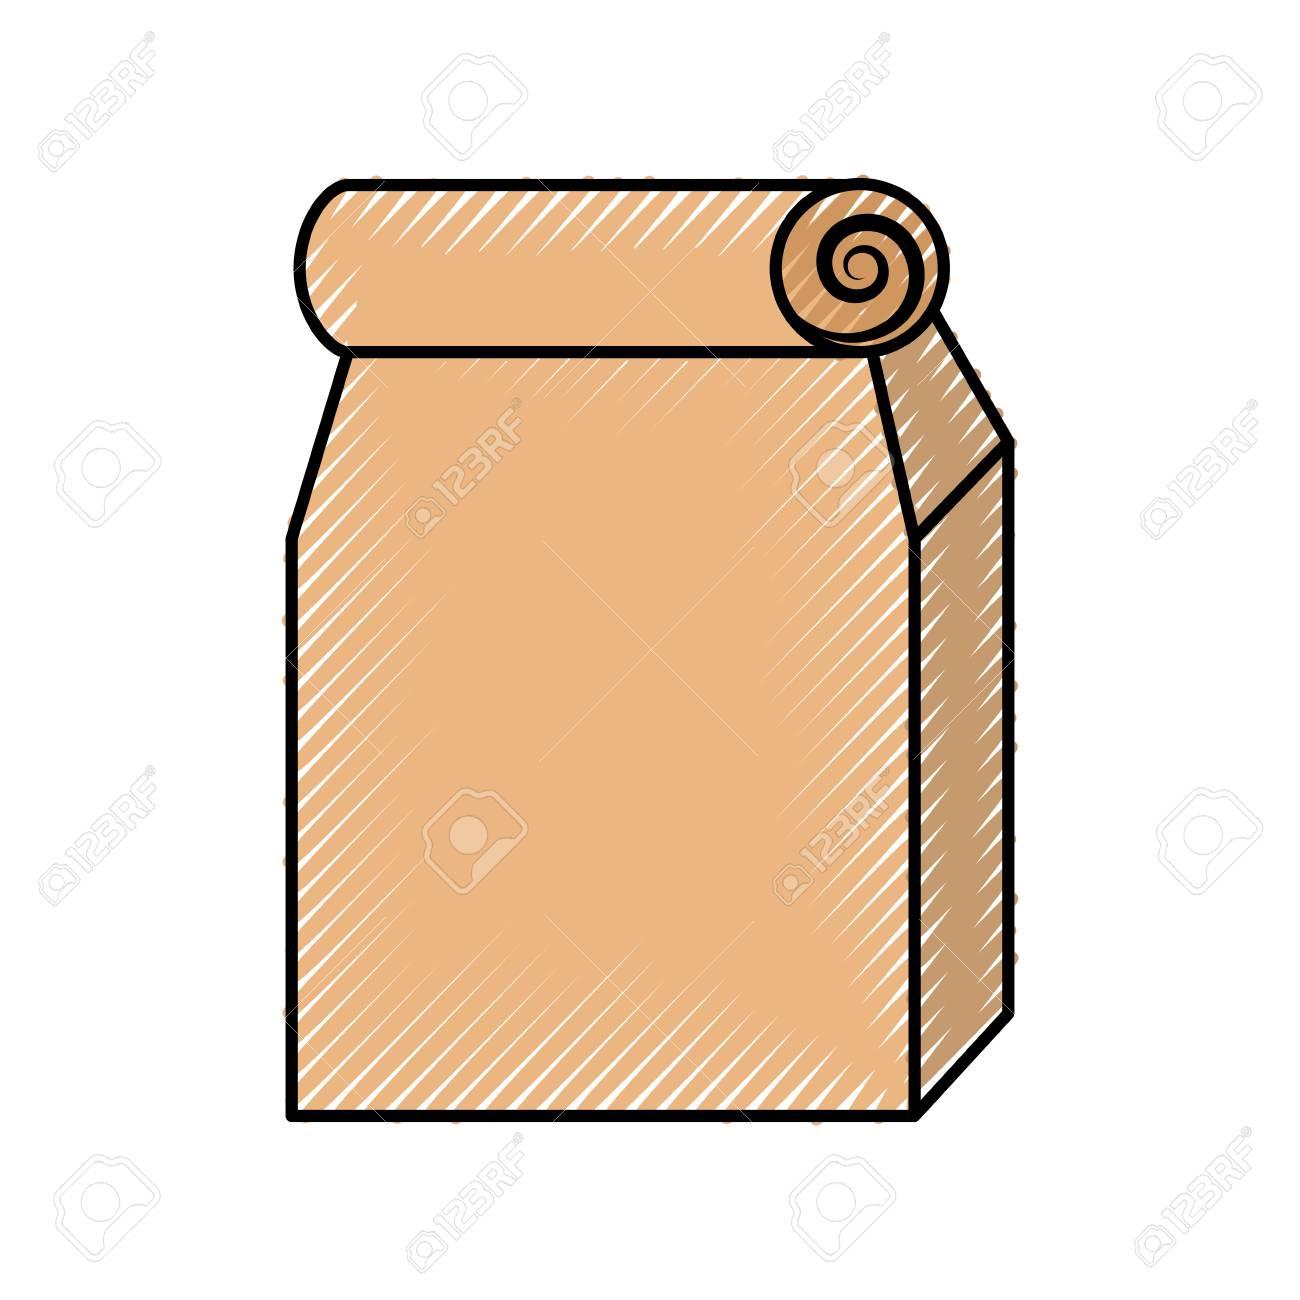 lunch bag in paper bag vector illustration design royalty free rh 123rf com paper bag princess clipart brown paper bag clipart